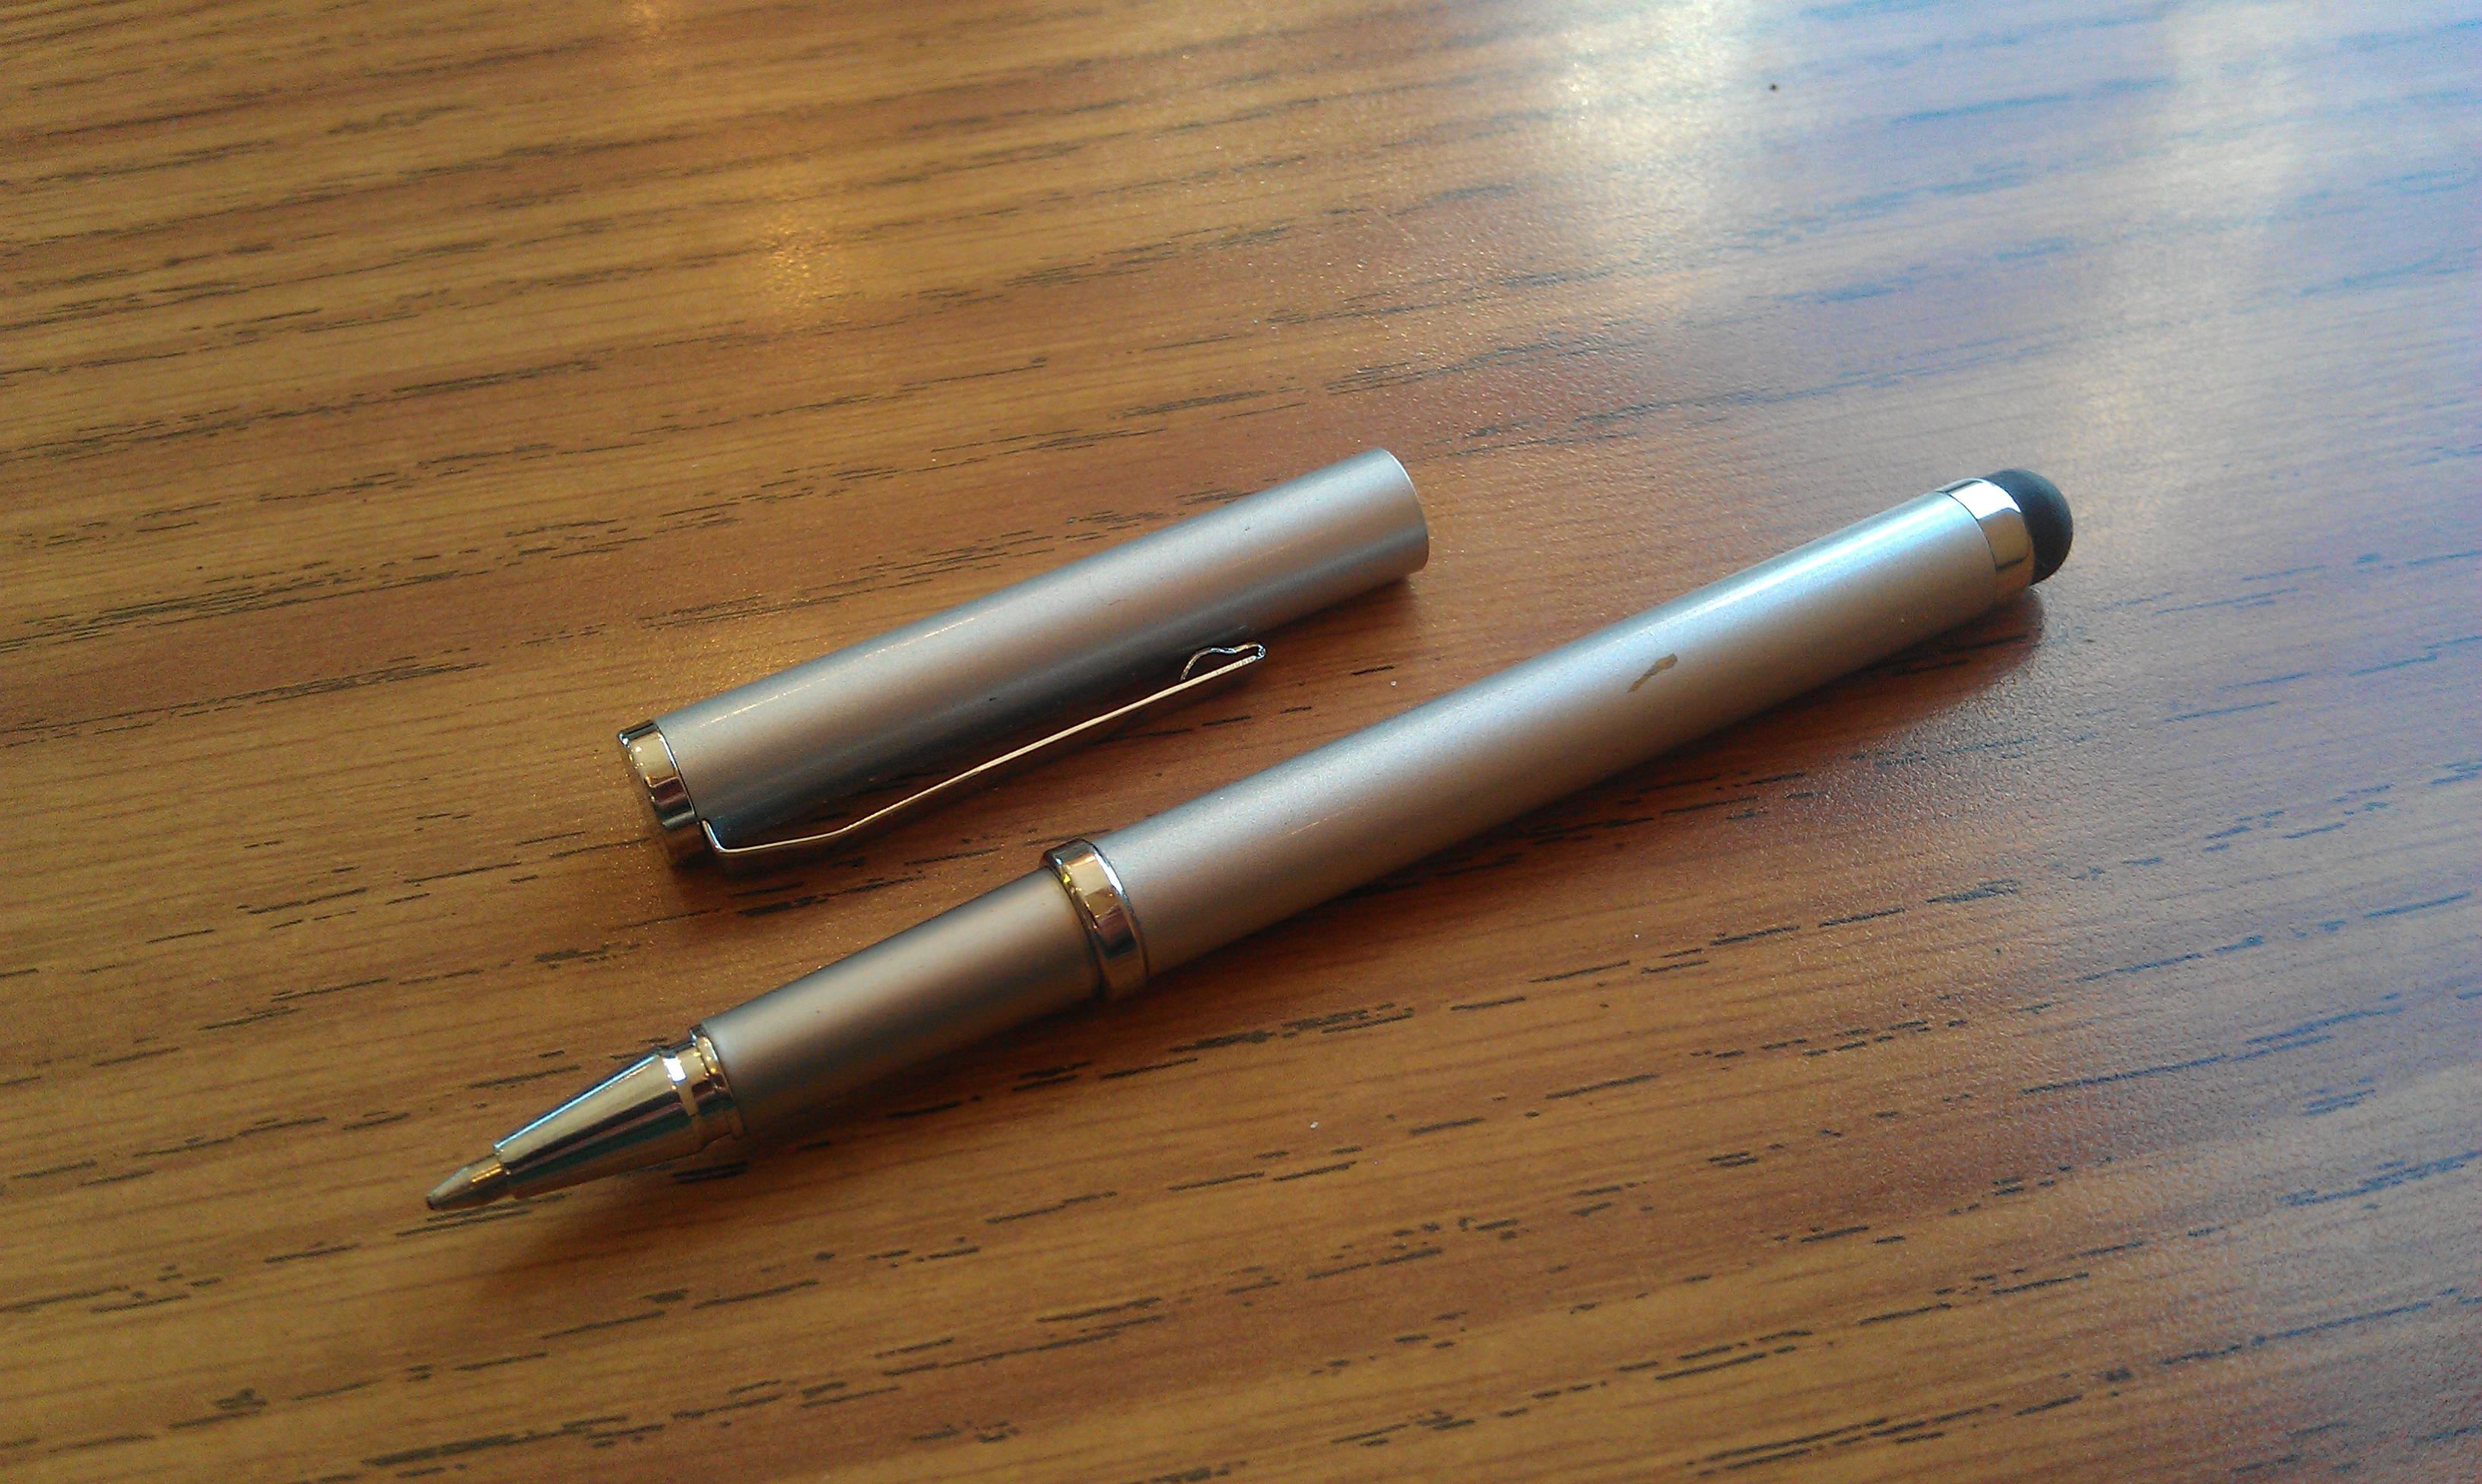 RocketFish Stylus and Pen